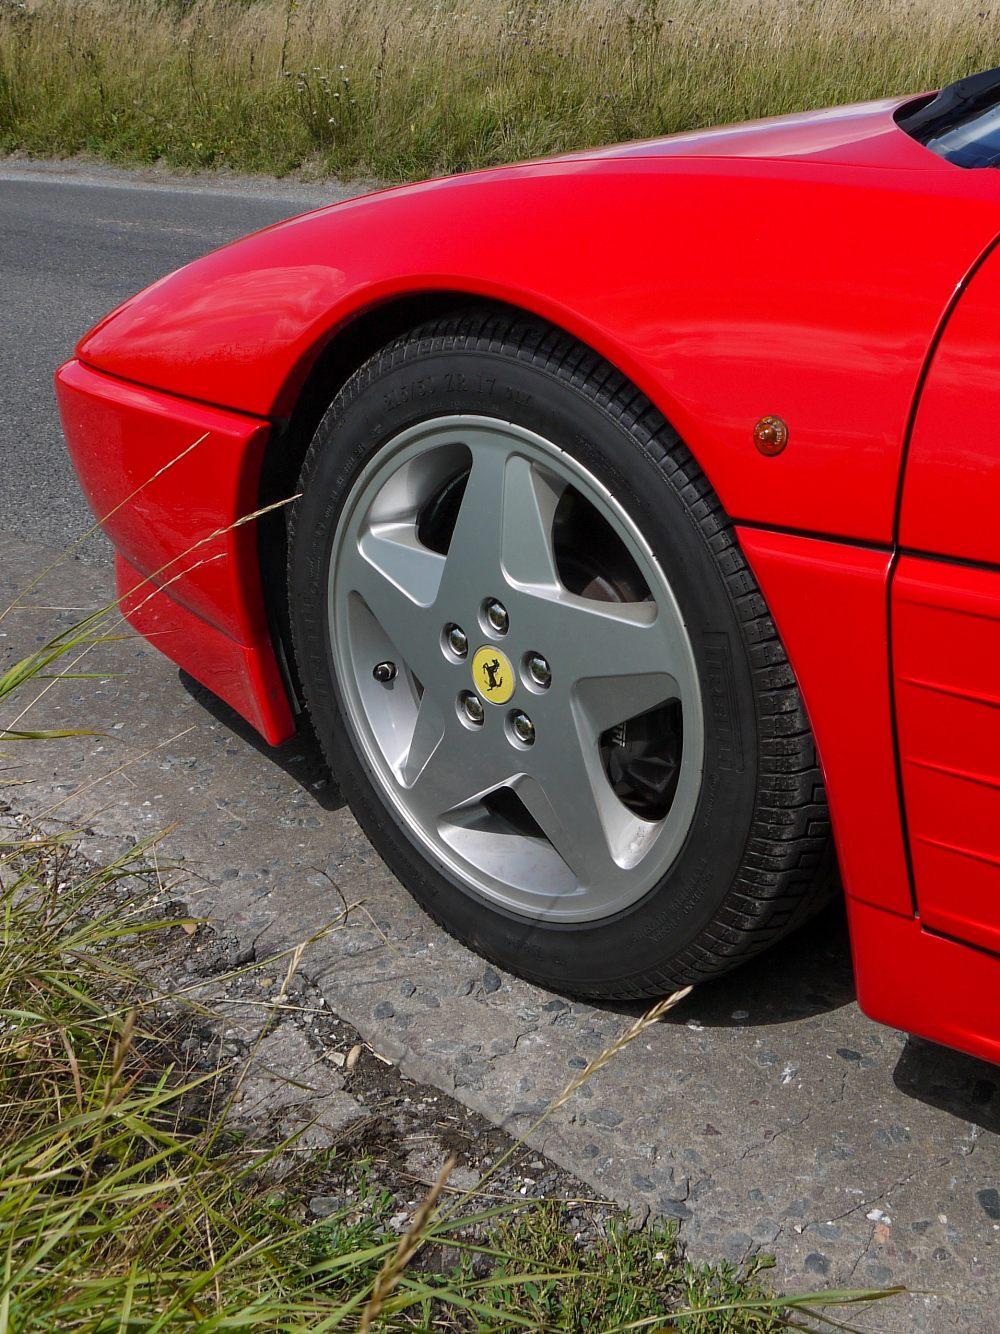 1993 FERRARI 348 TRASVERSALE BERLINETTA Registration Number: L796THC Chassis Number: - Image 16 of 49